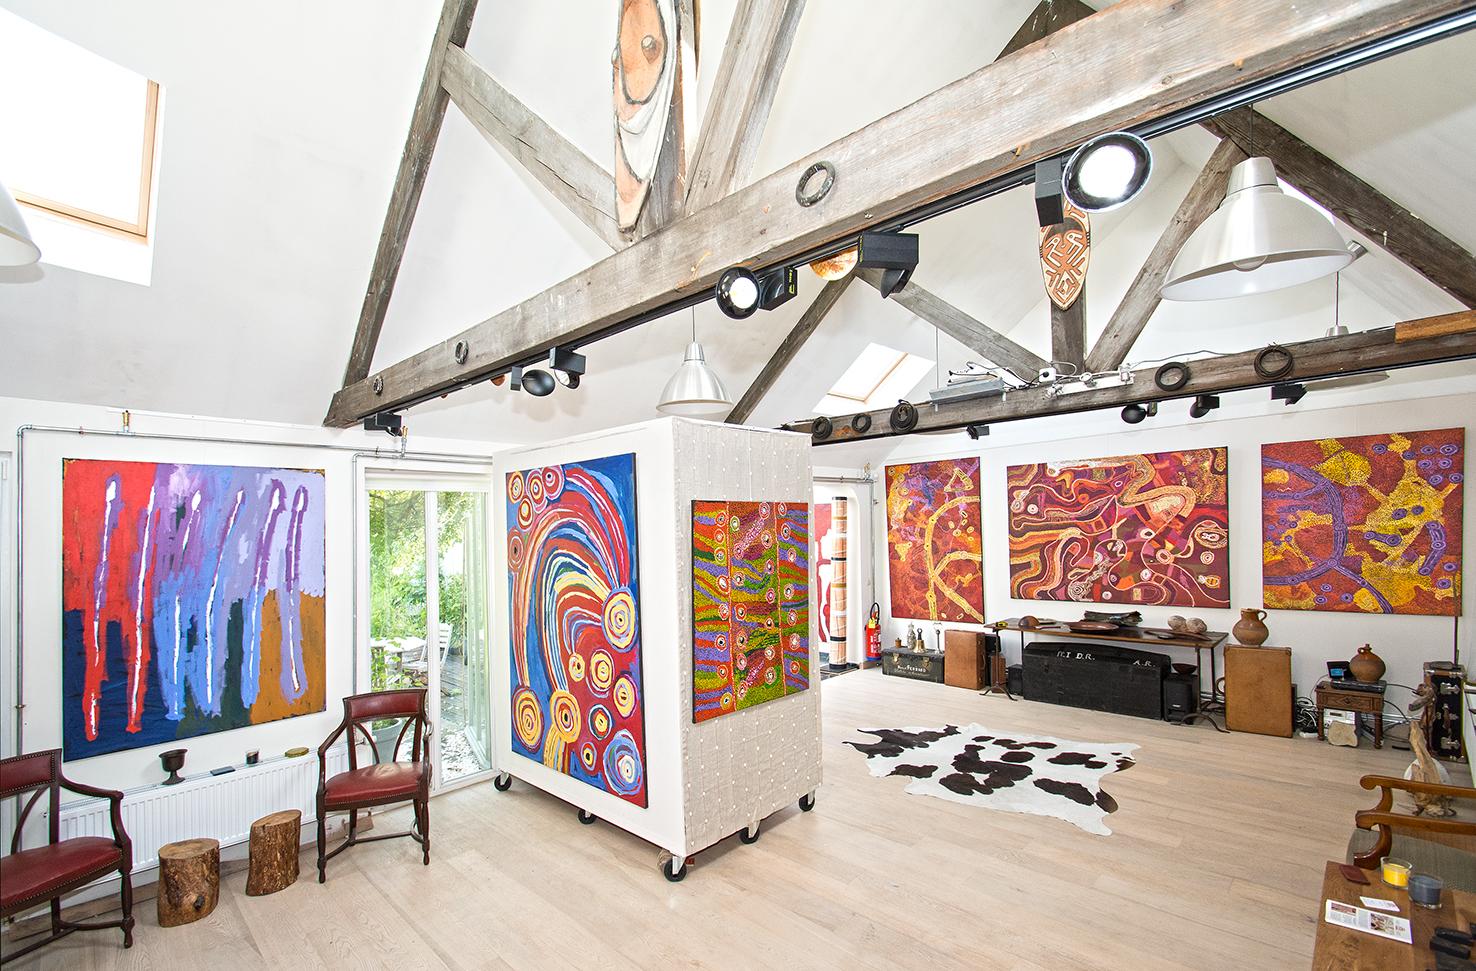 "De gauche à droite, œuvres de Freddy Ken, Barbara Moore, Wawiriya Buton, Sylvia Ken,Mick Wikilyiri, Sylvia Ken... présentées lors de l'exposition ""Paysages incarnés du désert (APY land)"". En partenariat avec Tjala Arts."